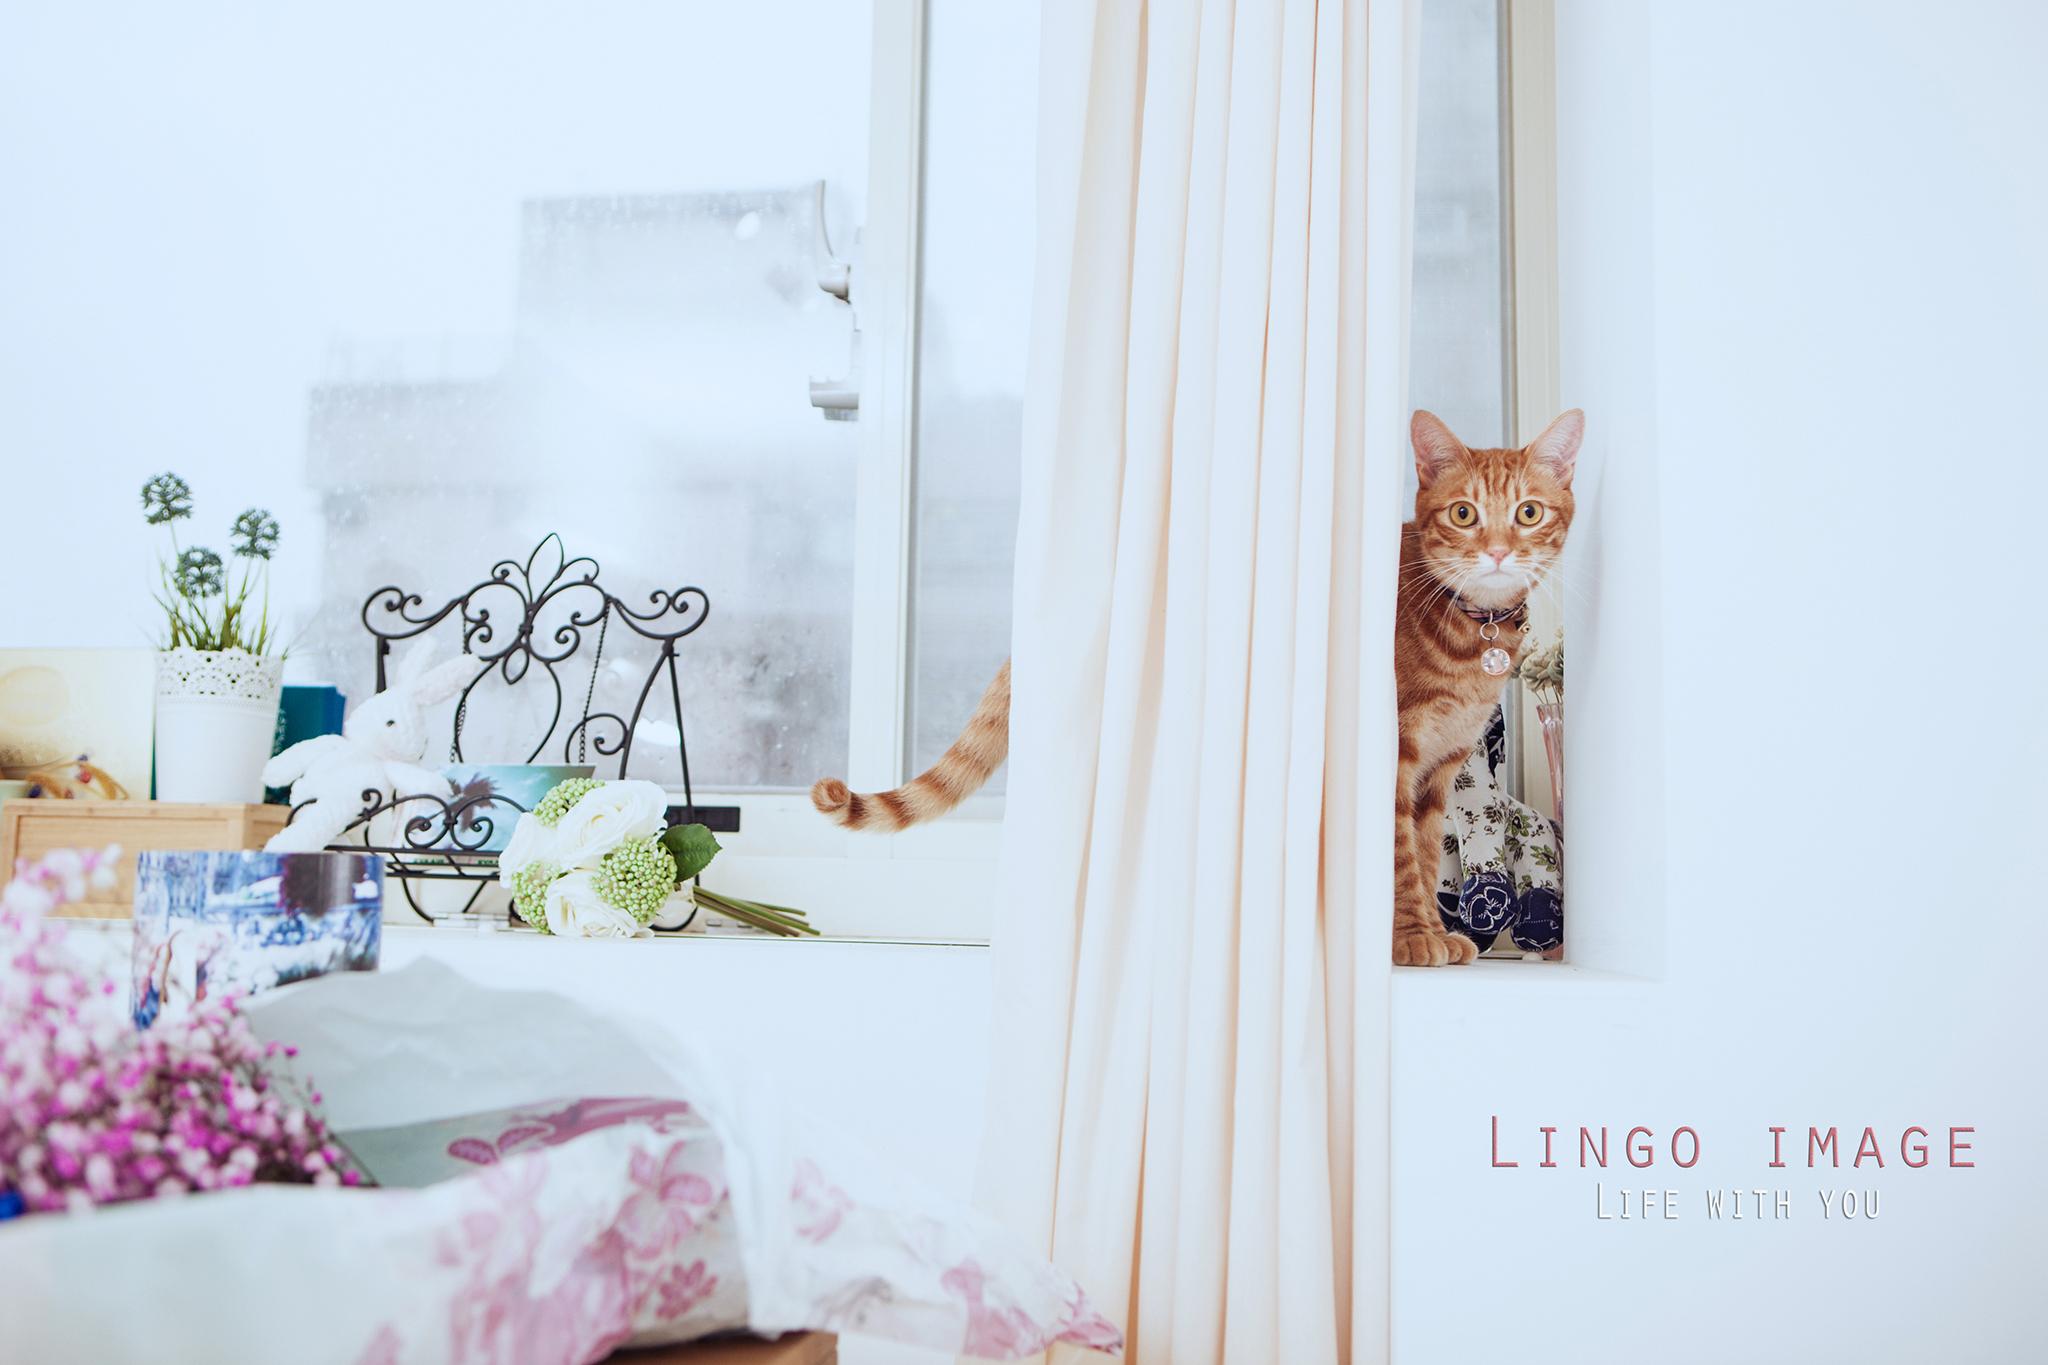 Lingo image_寵物79